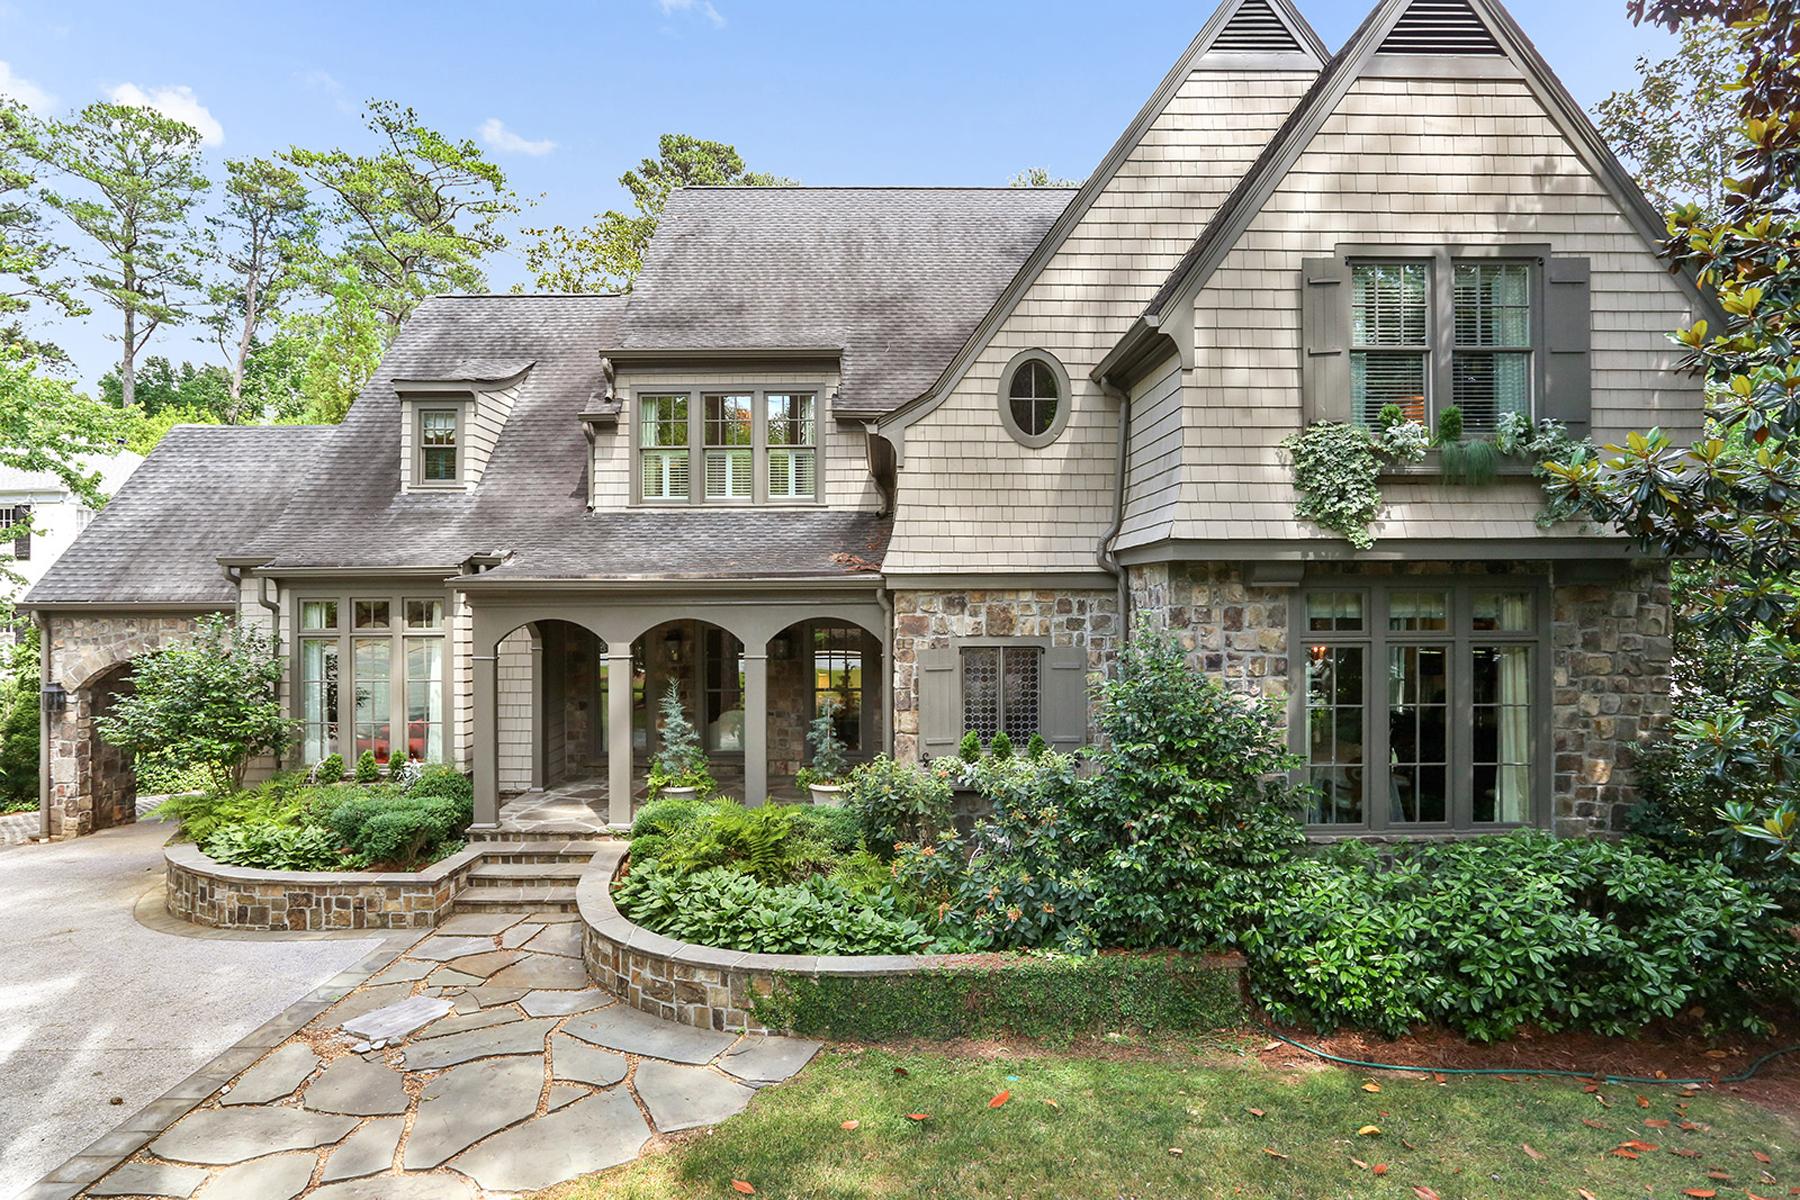 獨棟家庭住宅 為 出售 在 Immaculate Dutch Colonial Style Home In The Heart Of Buckhead 3303 Habersham Road NW Buckhead, Atlanta, 喬治亞州, 30305 美國